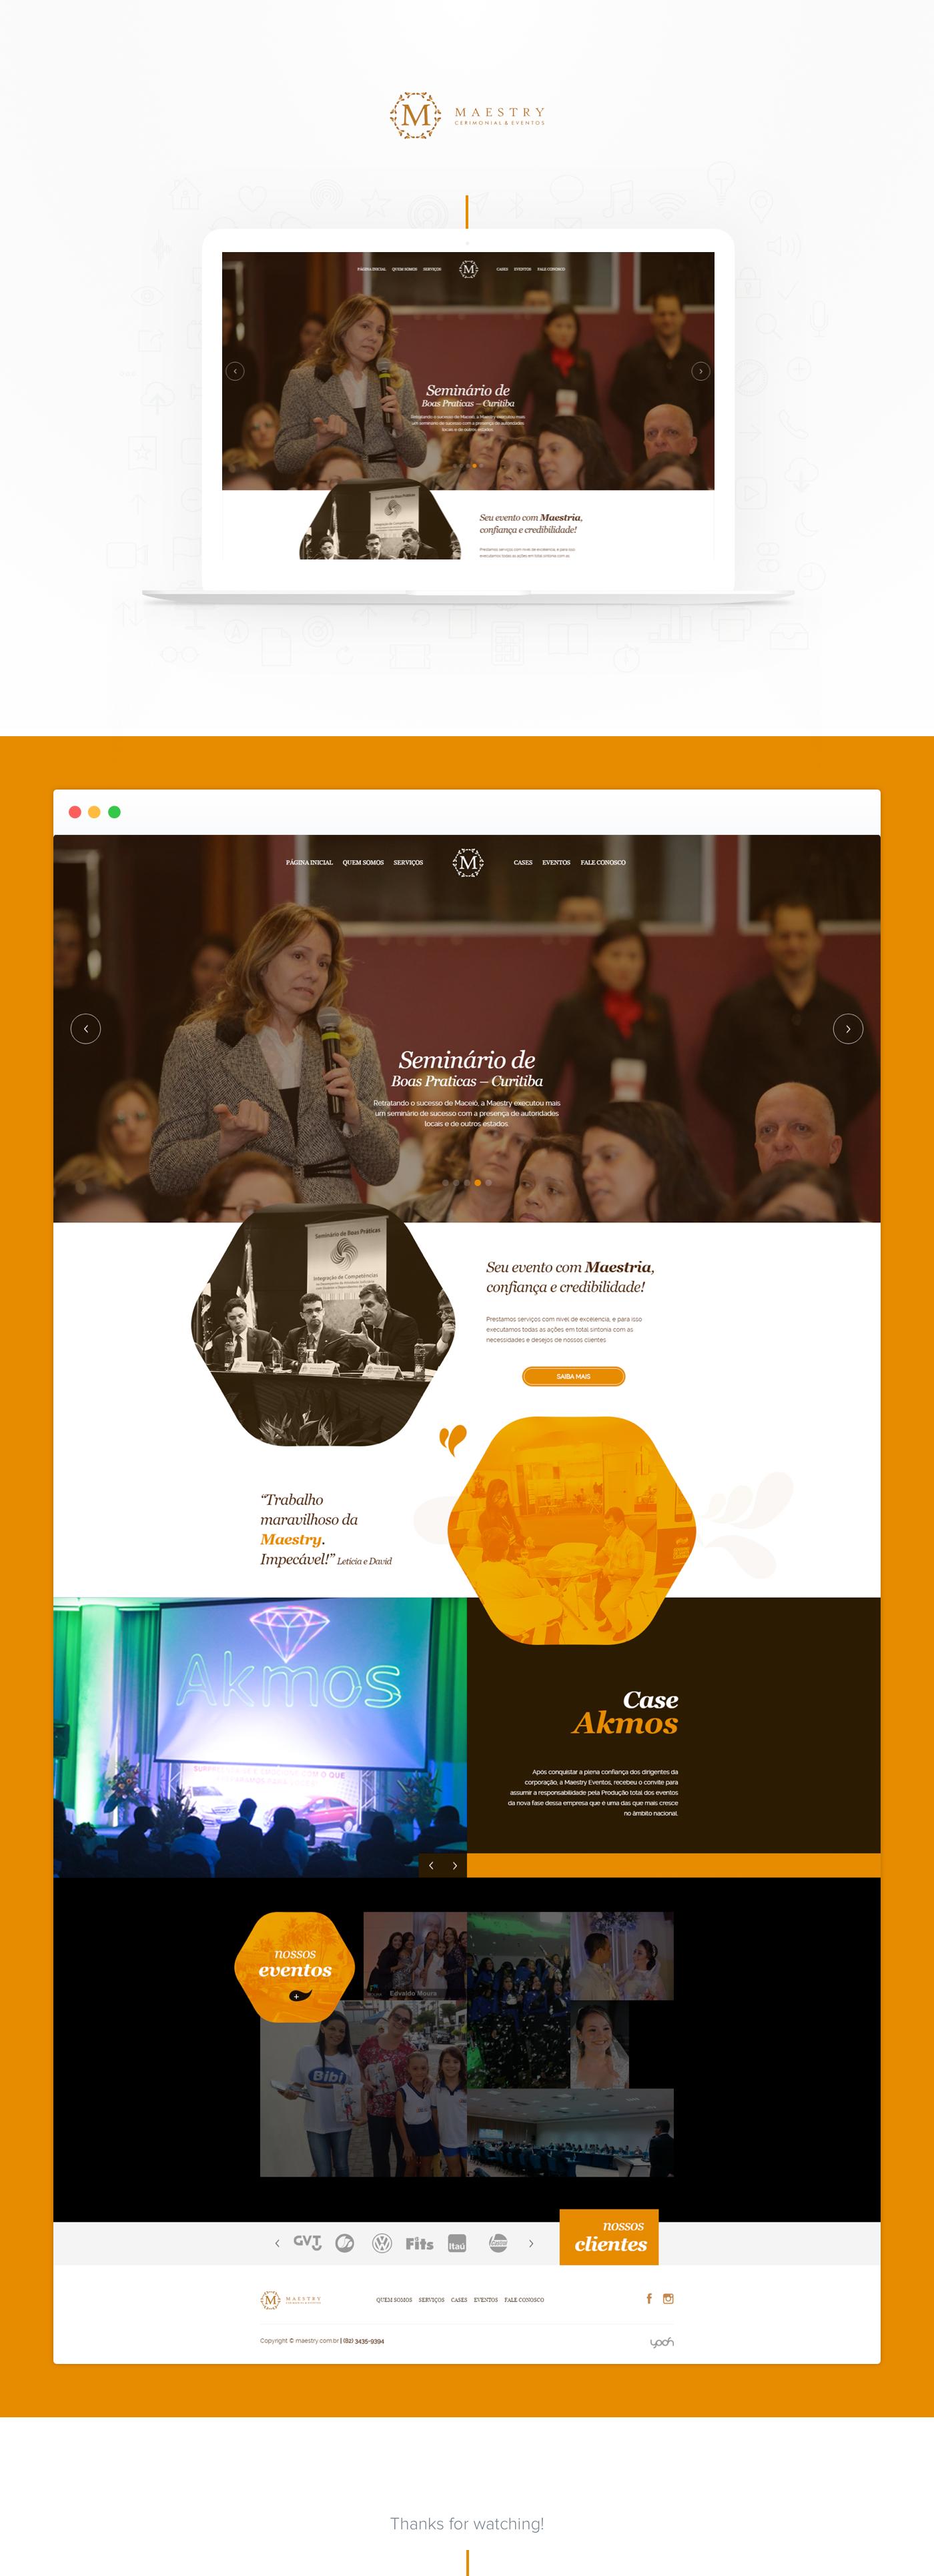 UI,design,back-end,ux,front-end,eventos,cerimonial